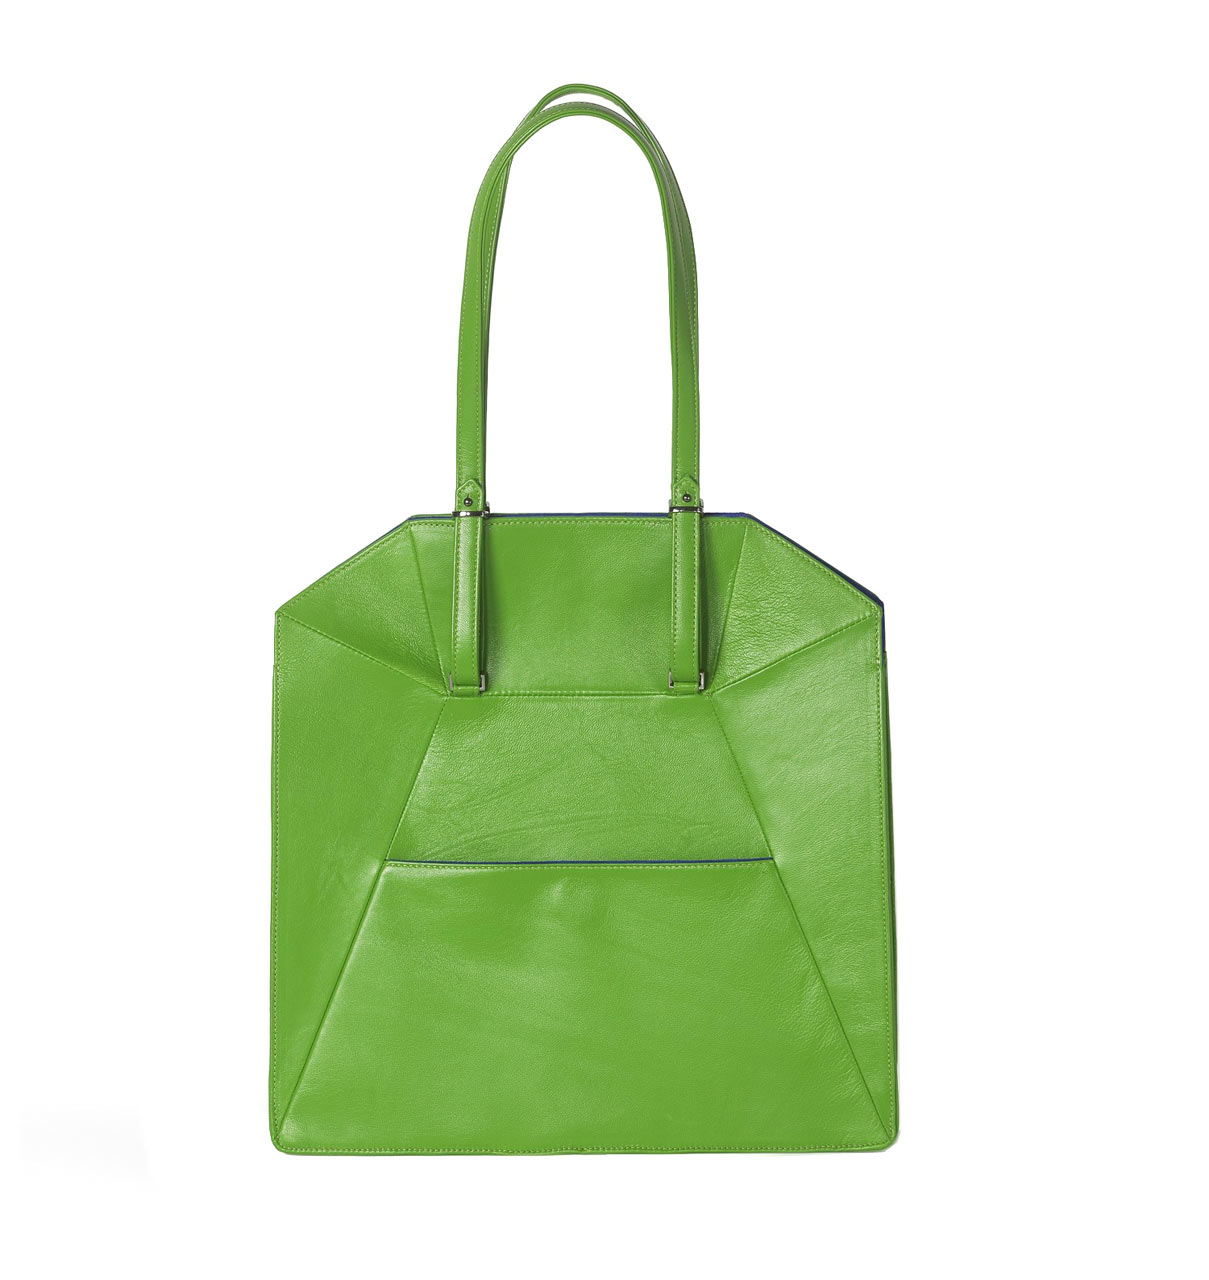 Imago-A-Prism-Bags-12-Tote-Avo